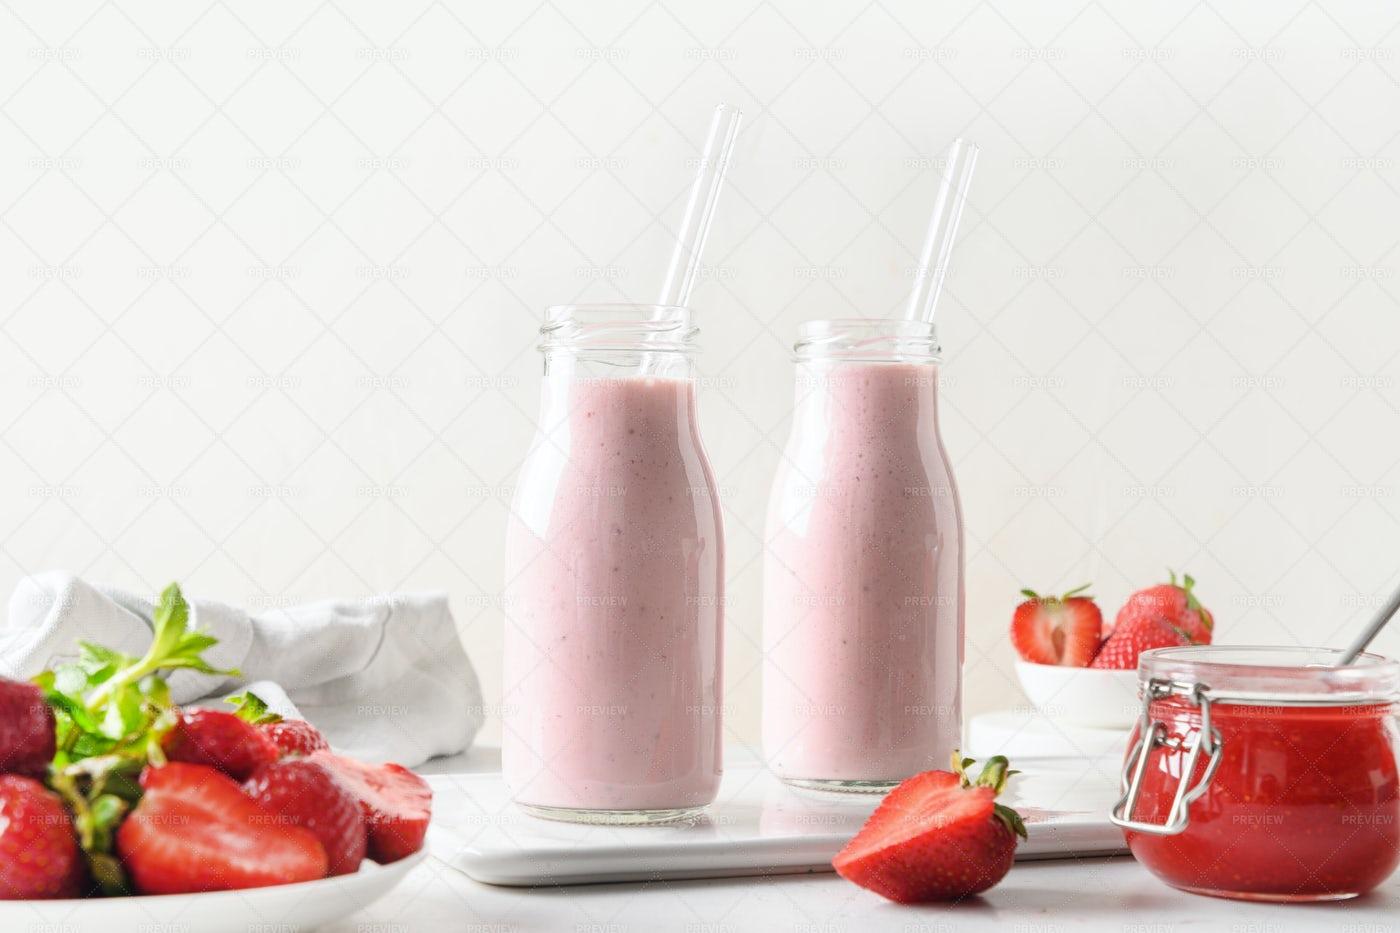 Strawberry Milkshakes: Stock Photos